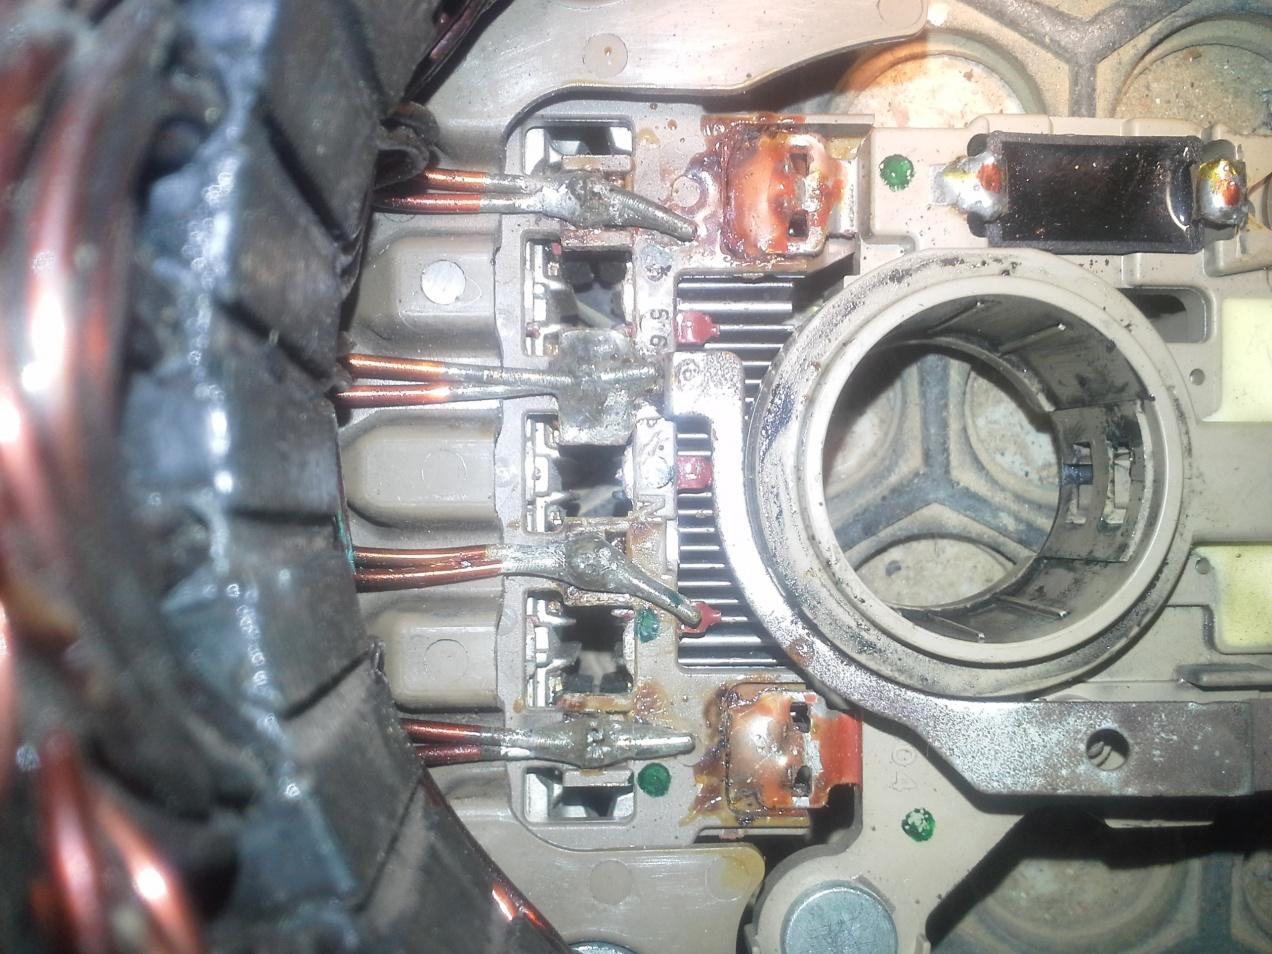 mando alternator wiring diagram the wiring mando marine alternator wiring diagram wirdig